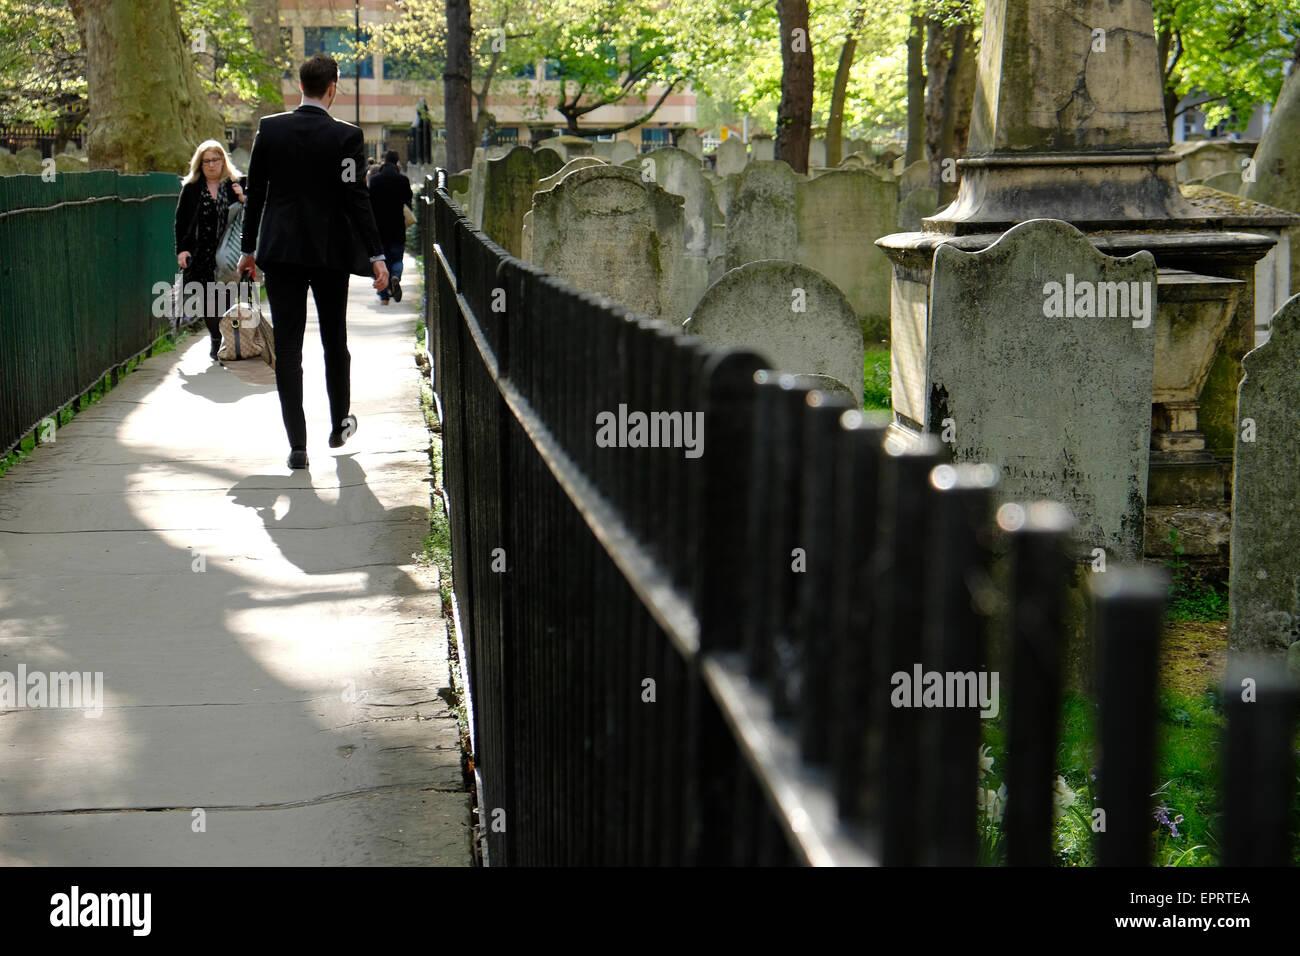 People walking along the  graveyard path or walkway in Bunhill Fields Cemetery, Islington, City of London EC1  UK - Stock Image